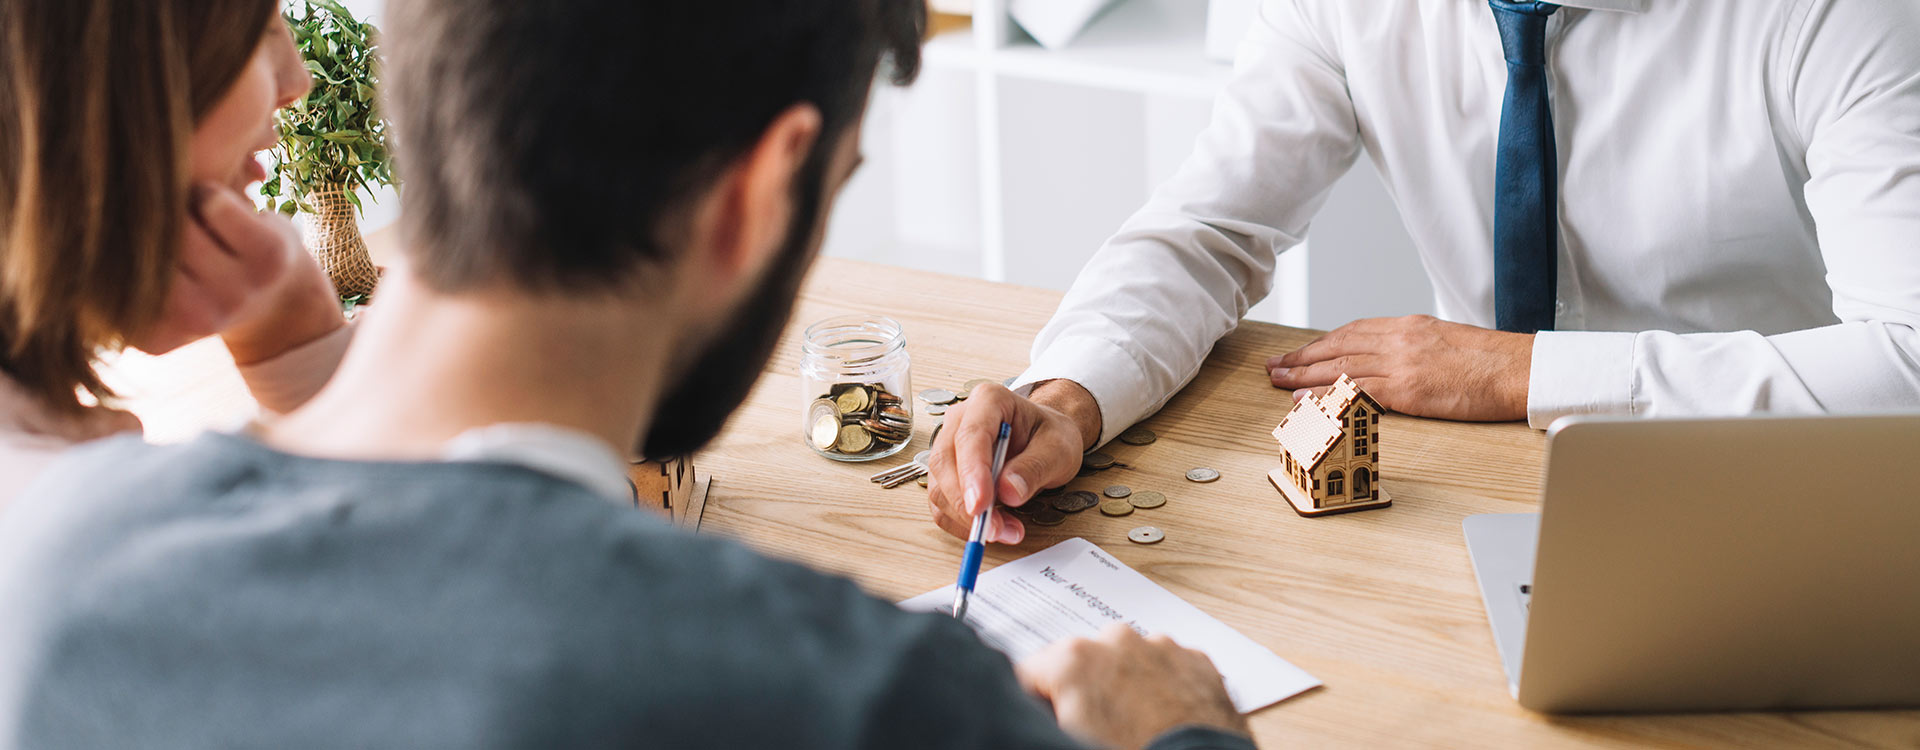 aequitasabogados-irph-prestamos-viviendas-hipoteca-abogados-talavera